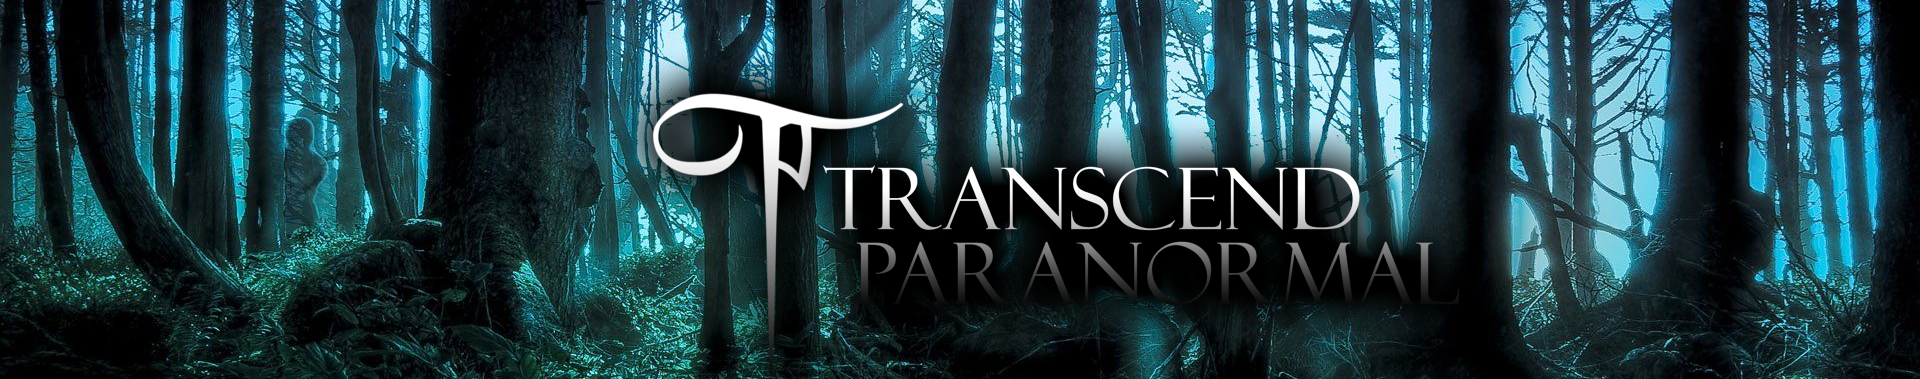 Transcend Paranormal